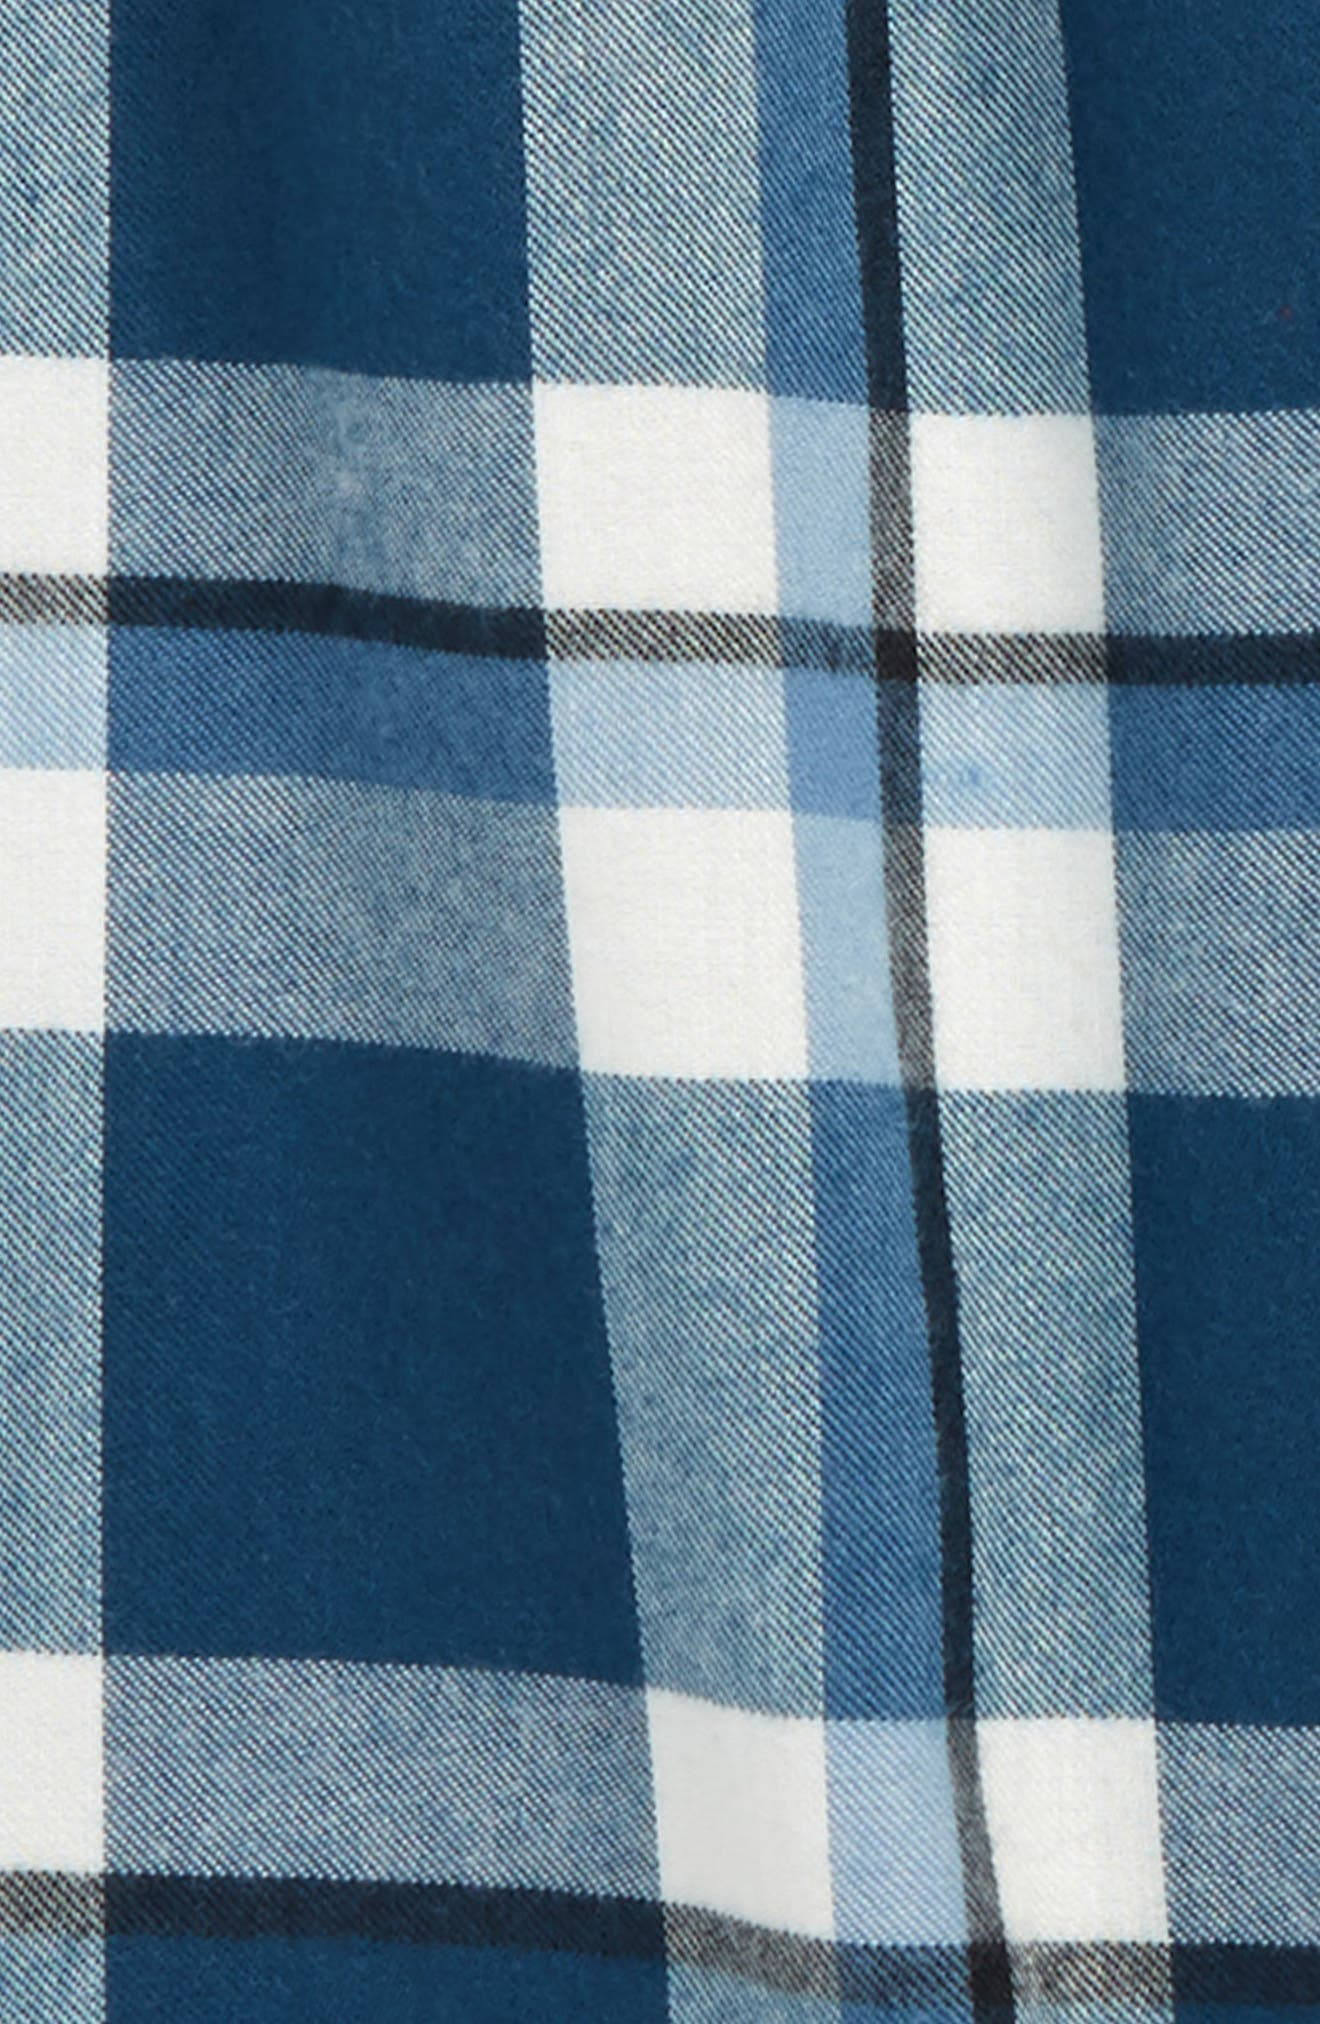 Plaid Flannel Pants,                             Alternate thumbnail 2, color,                             BLUE WING- IVORY PLAID